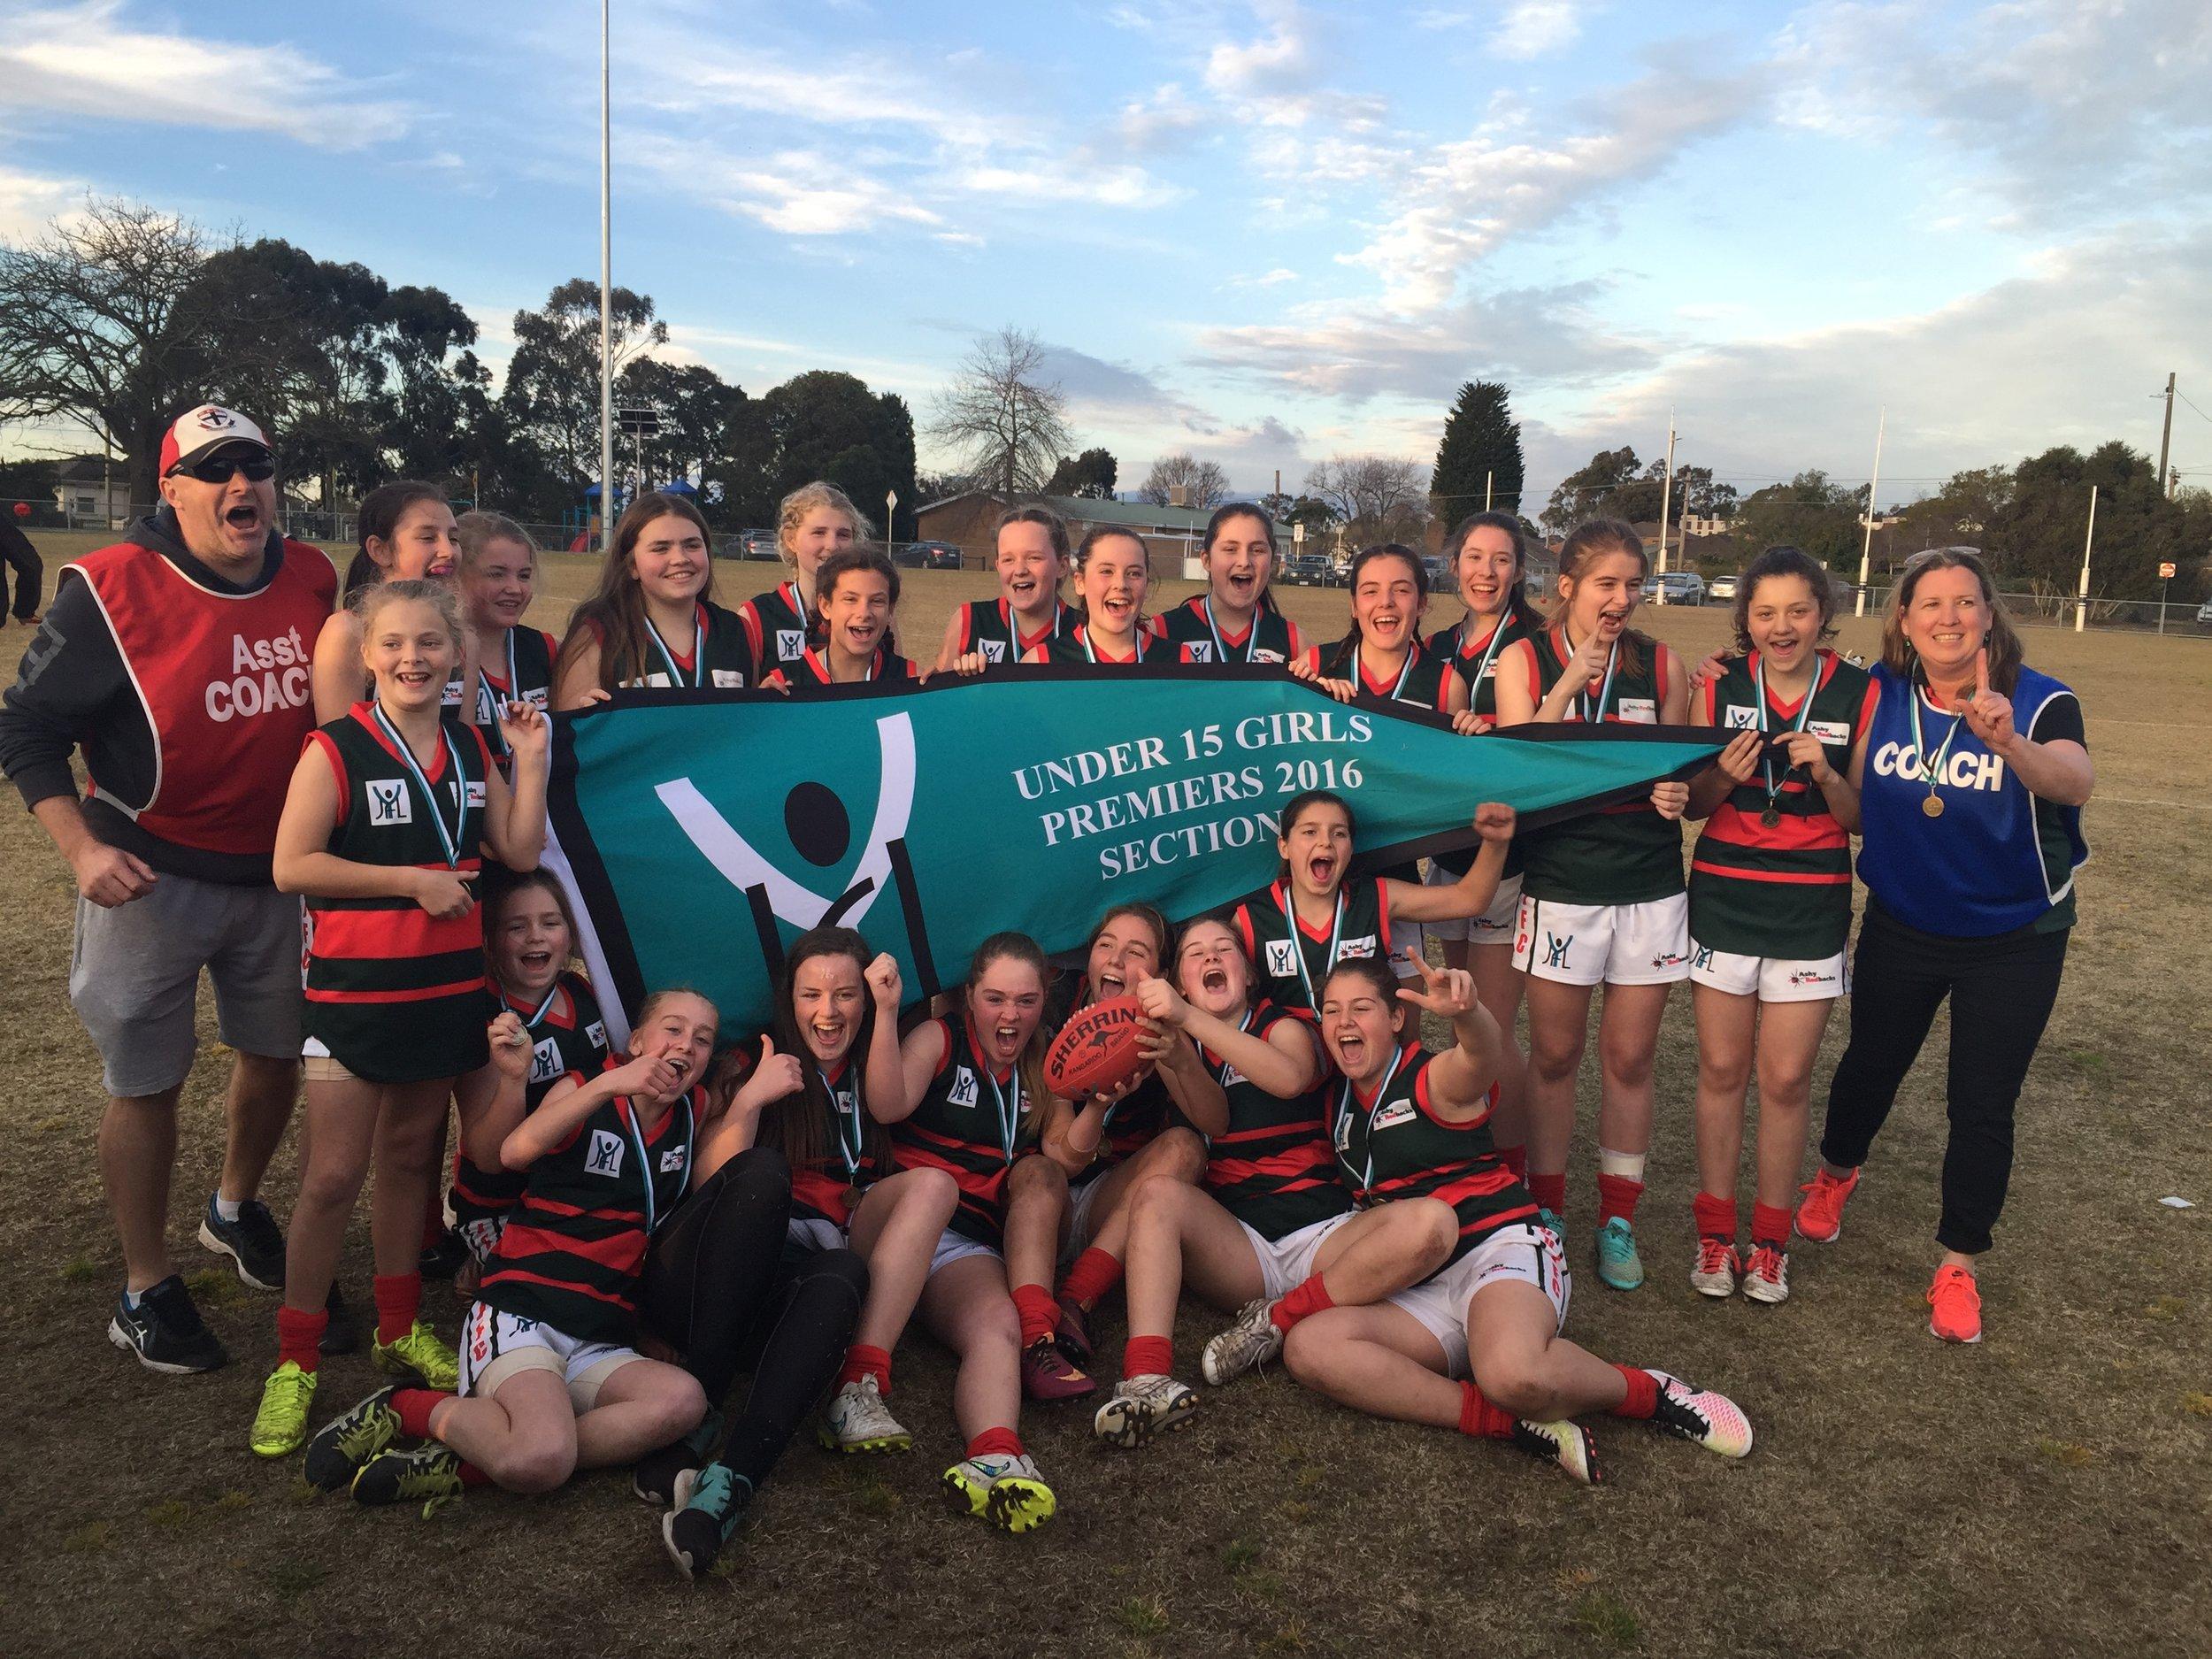 U15 Girls Green  Coach: Kim Ledder Under 15 Division 3 Premiers